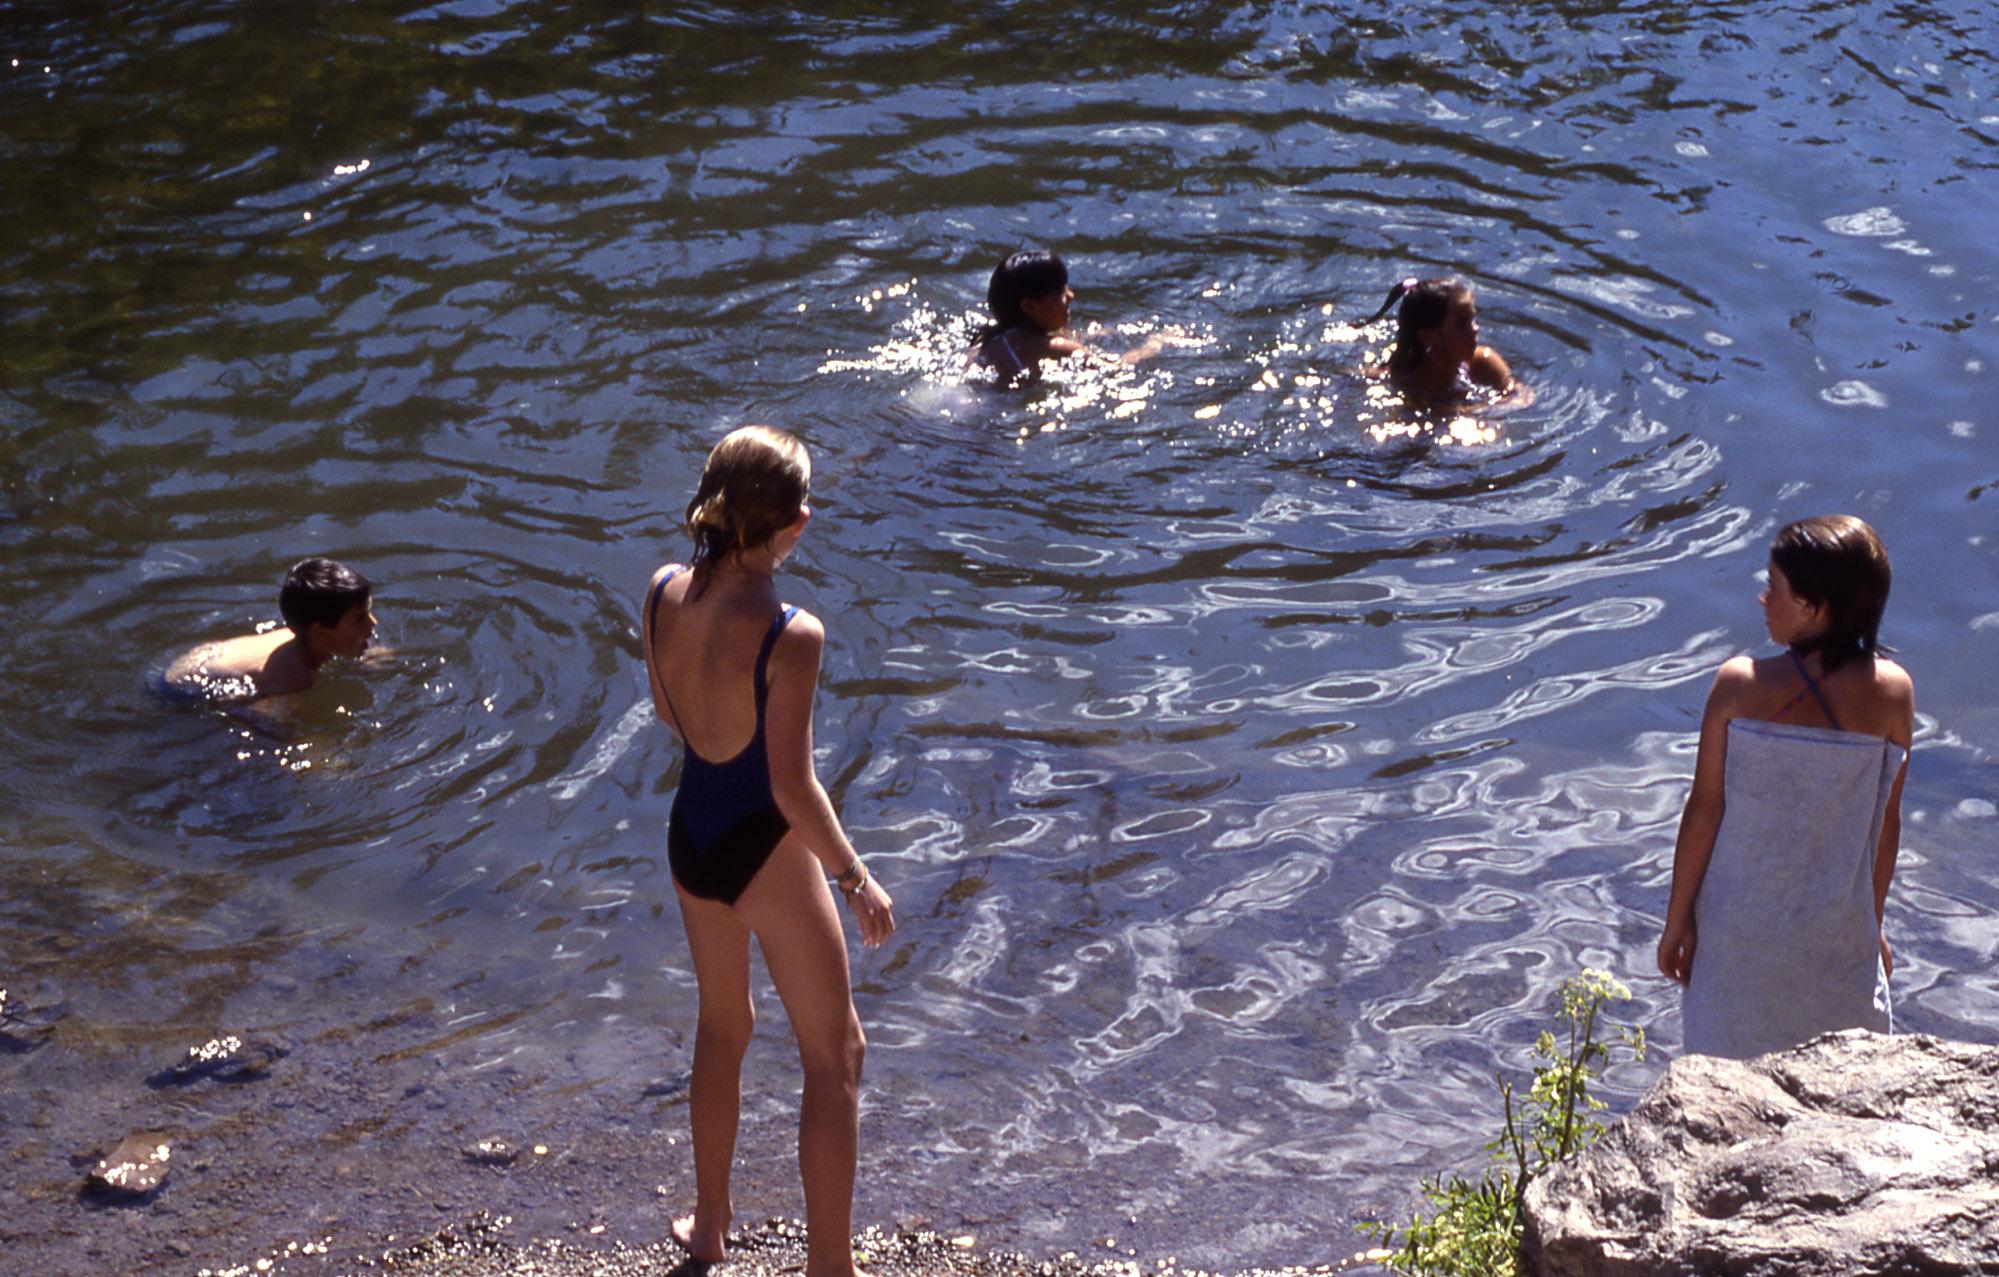 Kids Swimming In A Lake yellowstone digital slide file